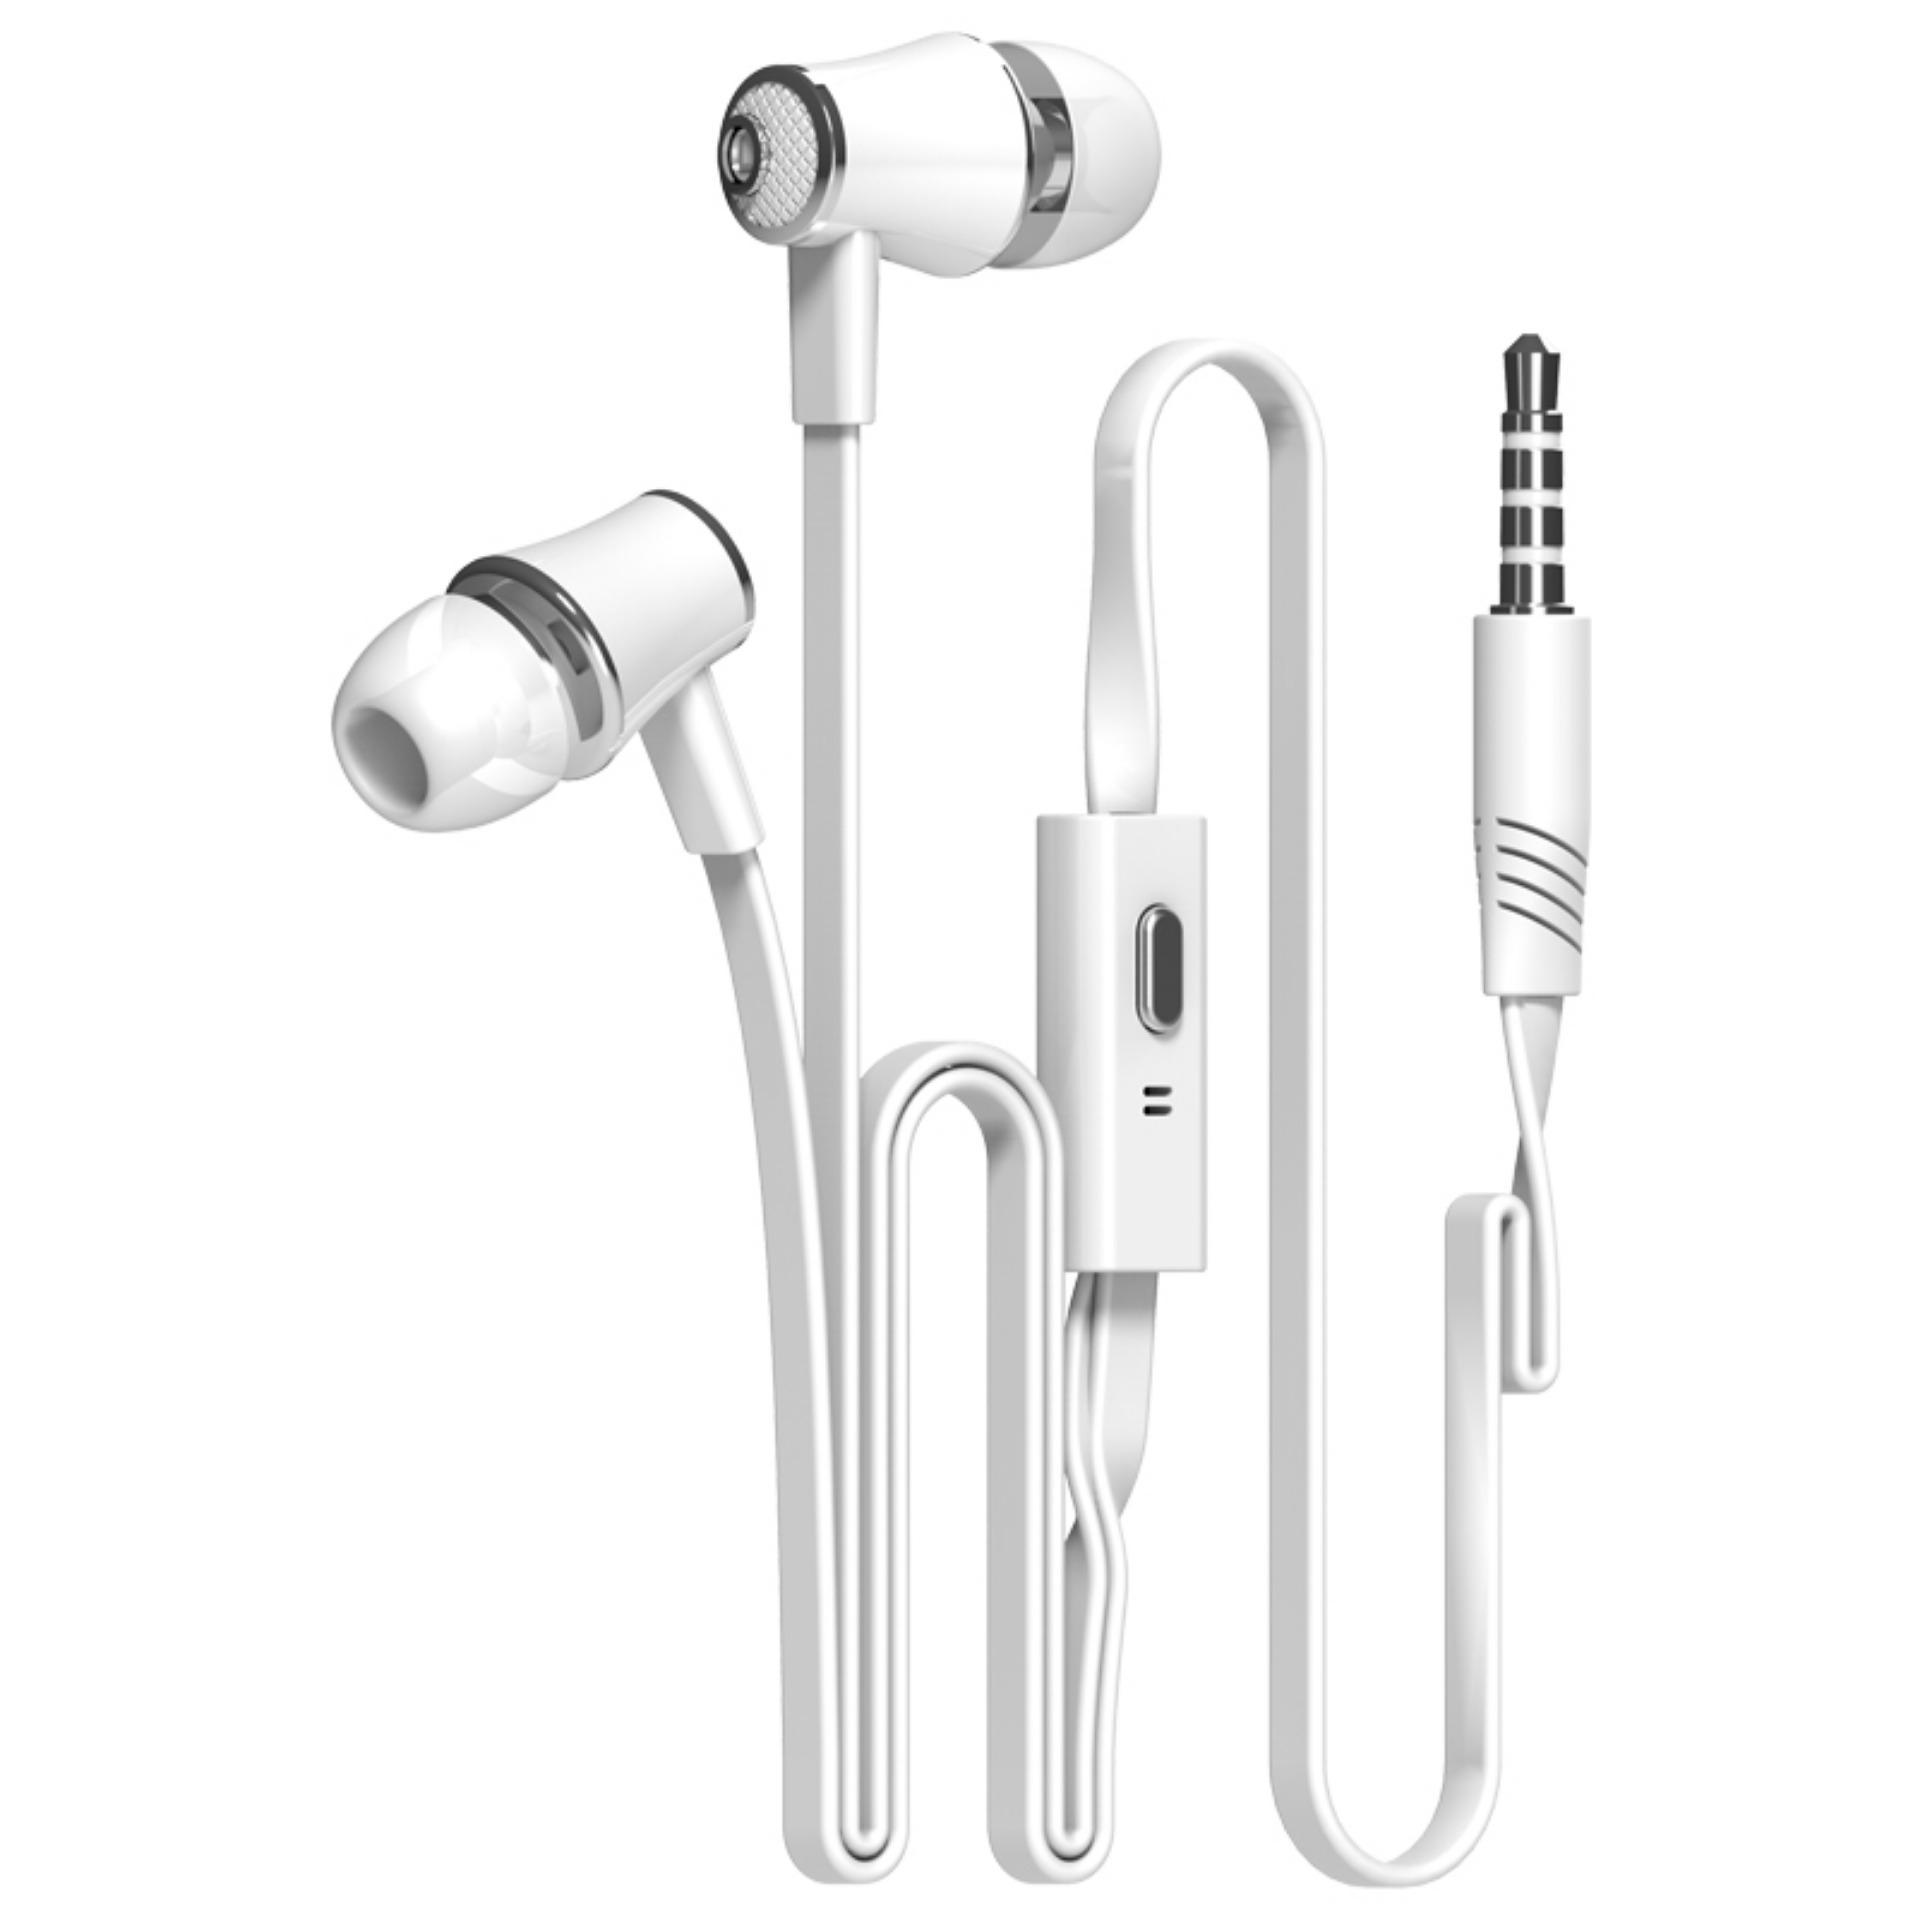 Langsdom Jm21 Stereo Earphone Super Bass Earphones Headset WireHeadset Support For iPhone Samsung .